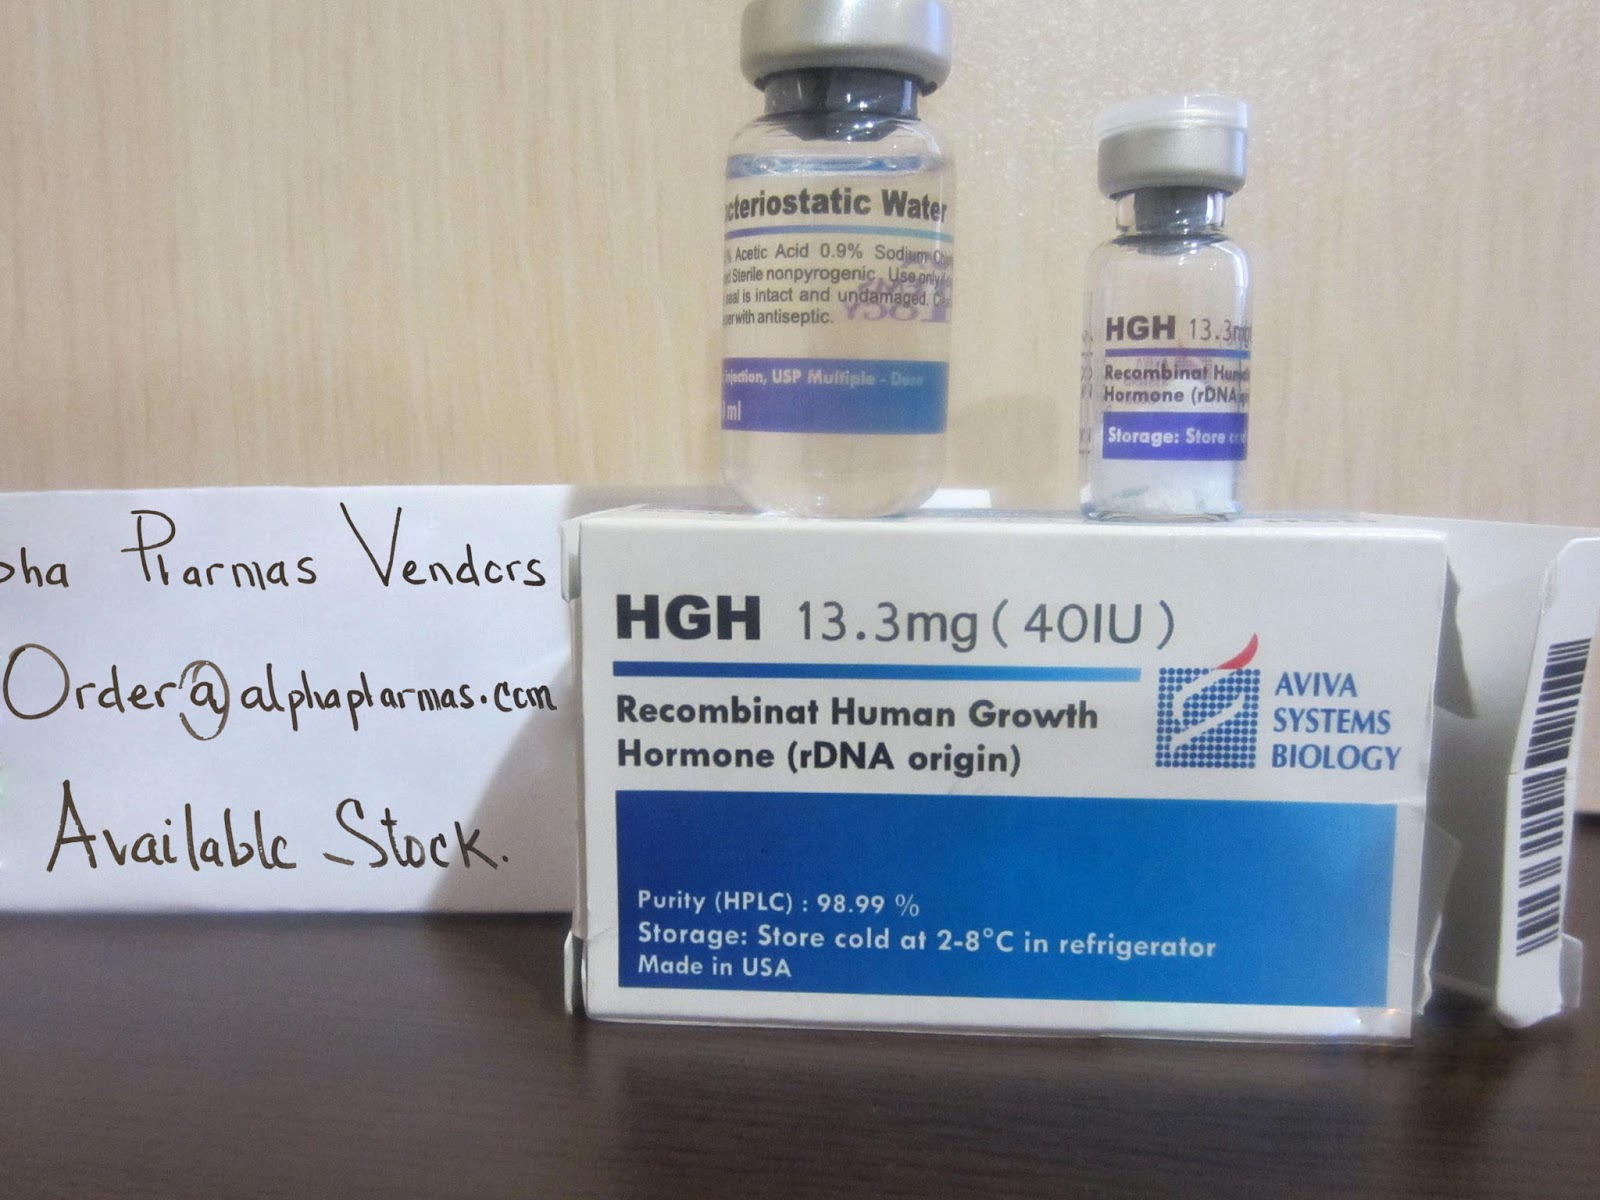 Actavis Promethazine Codeine Cough Syrup For Sale Online Text at